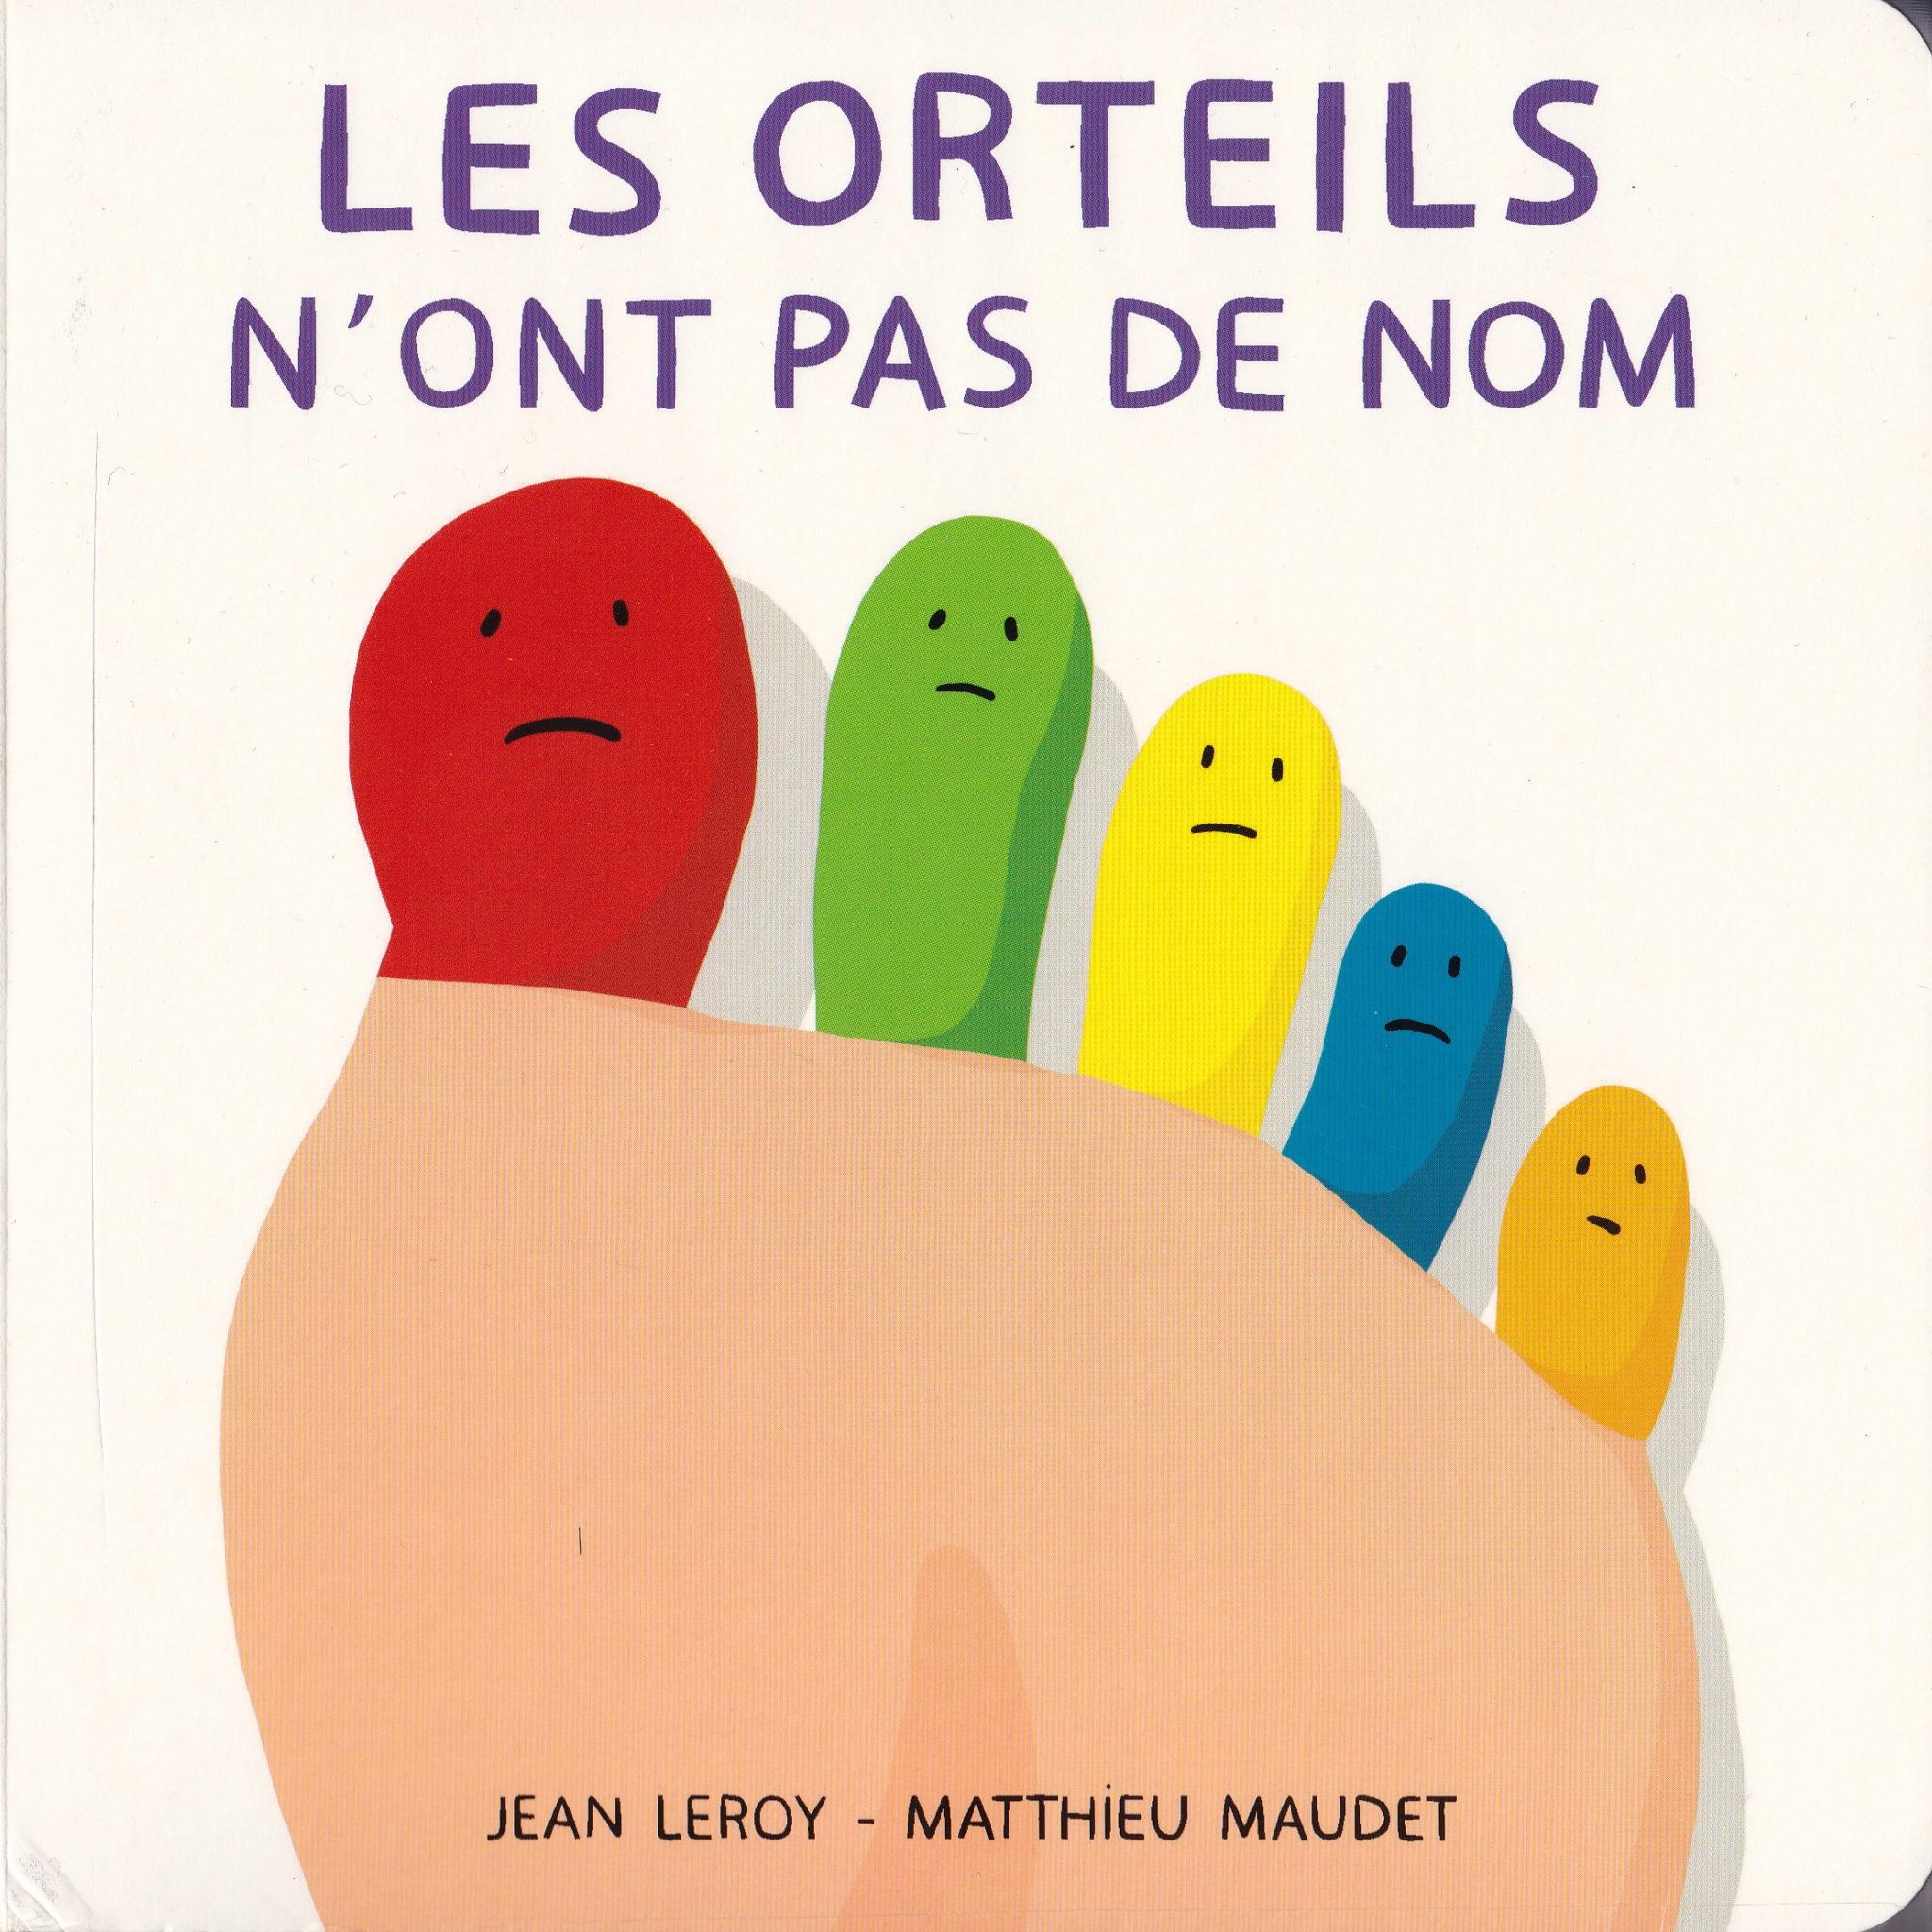 http://aimeelafee.com/blog/wp-content/uploads/2011/01/orteils-1.jpg